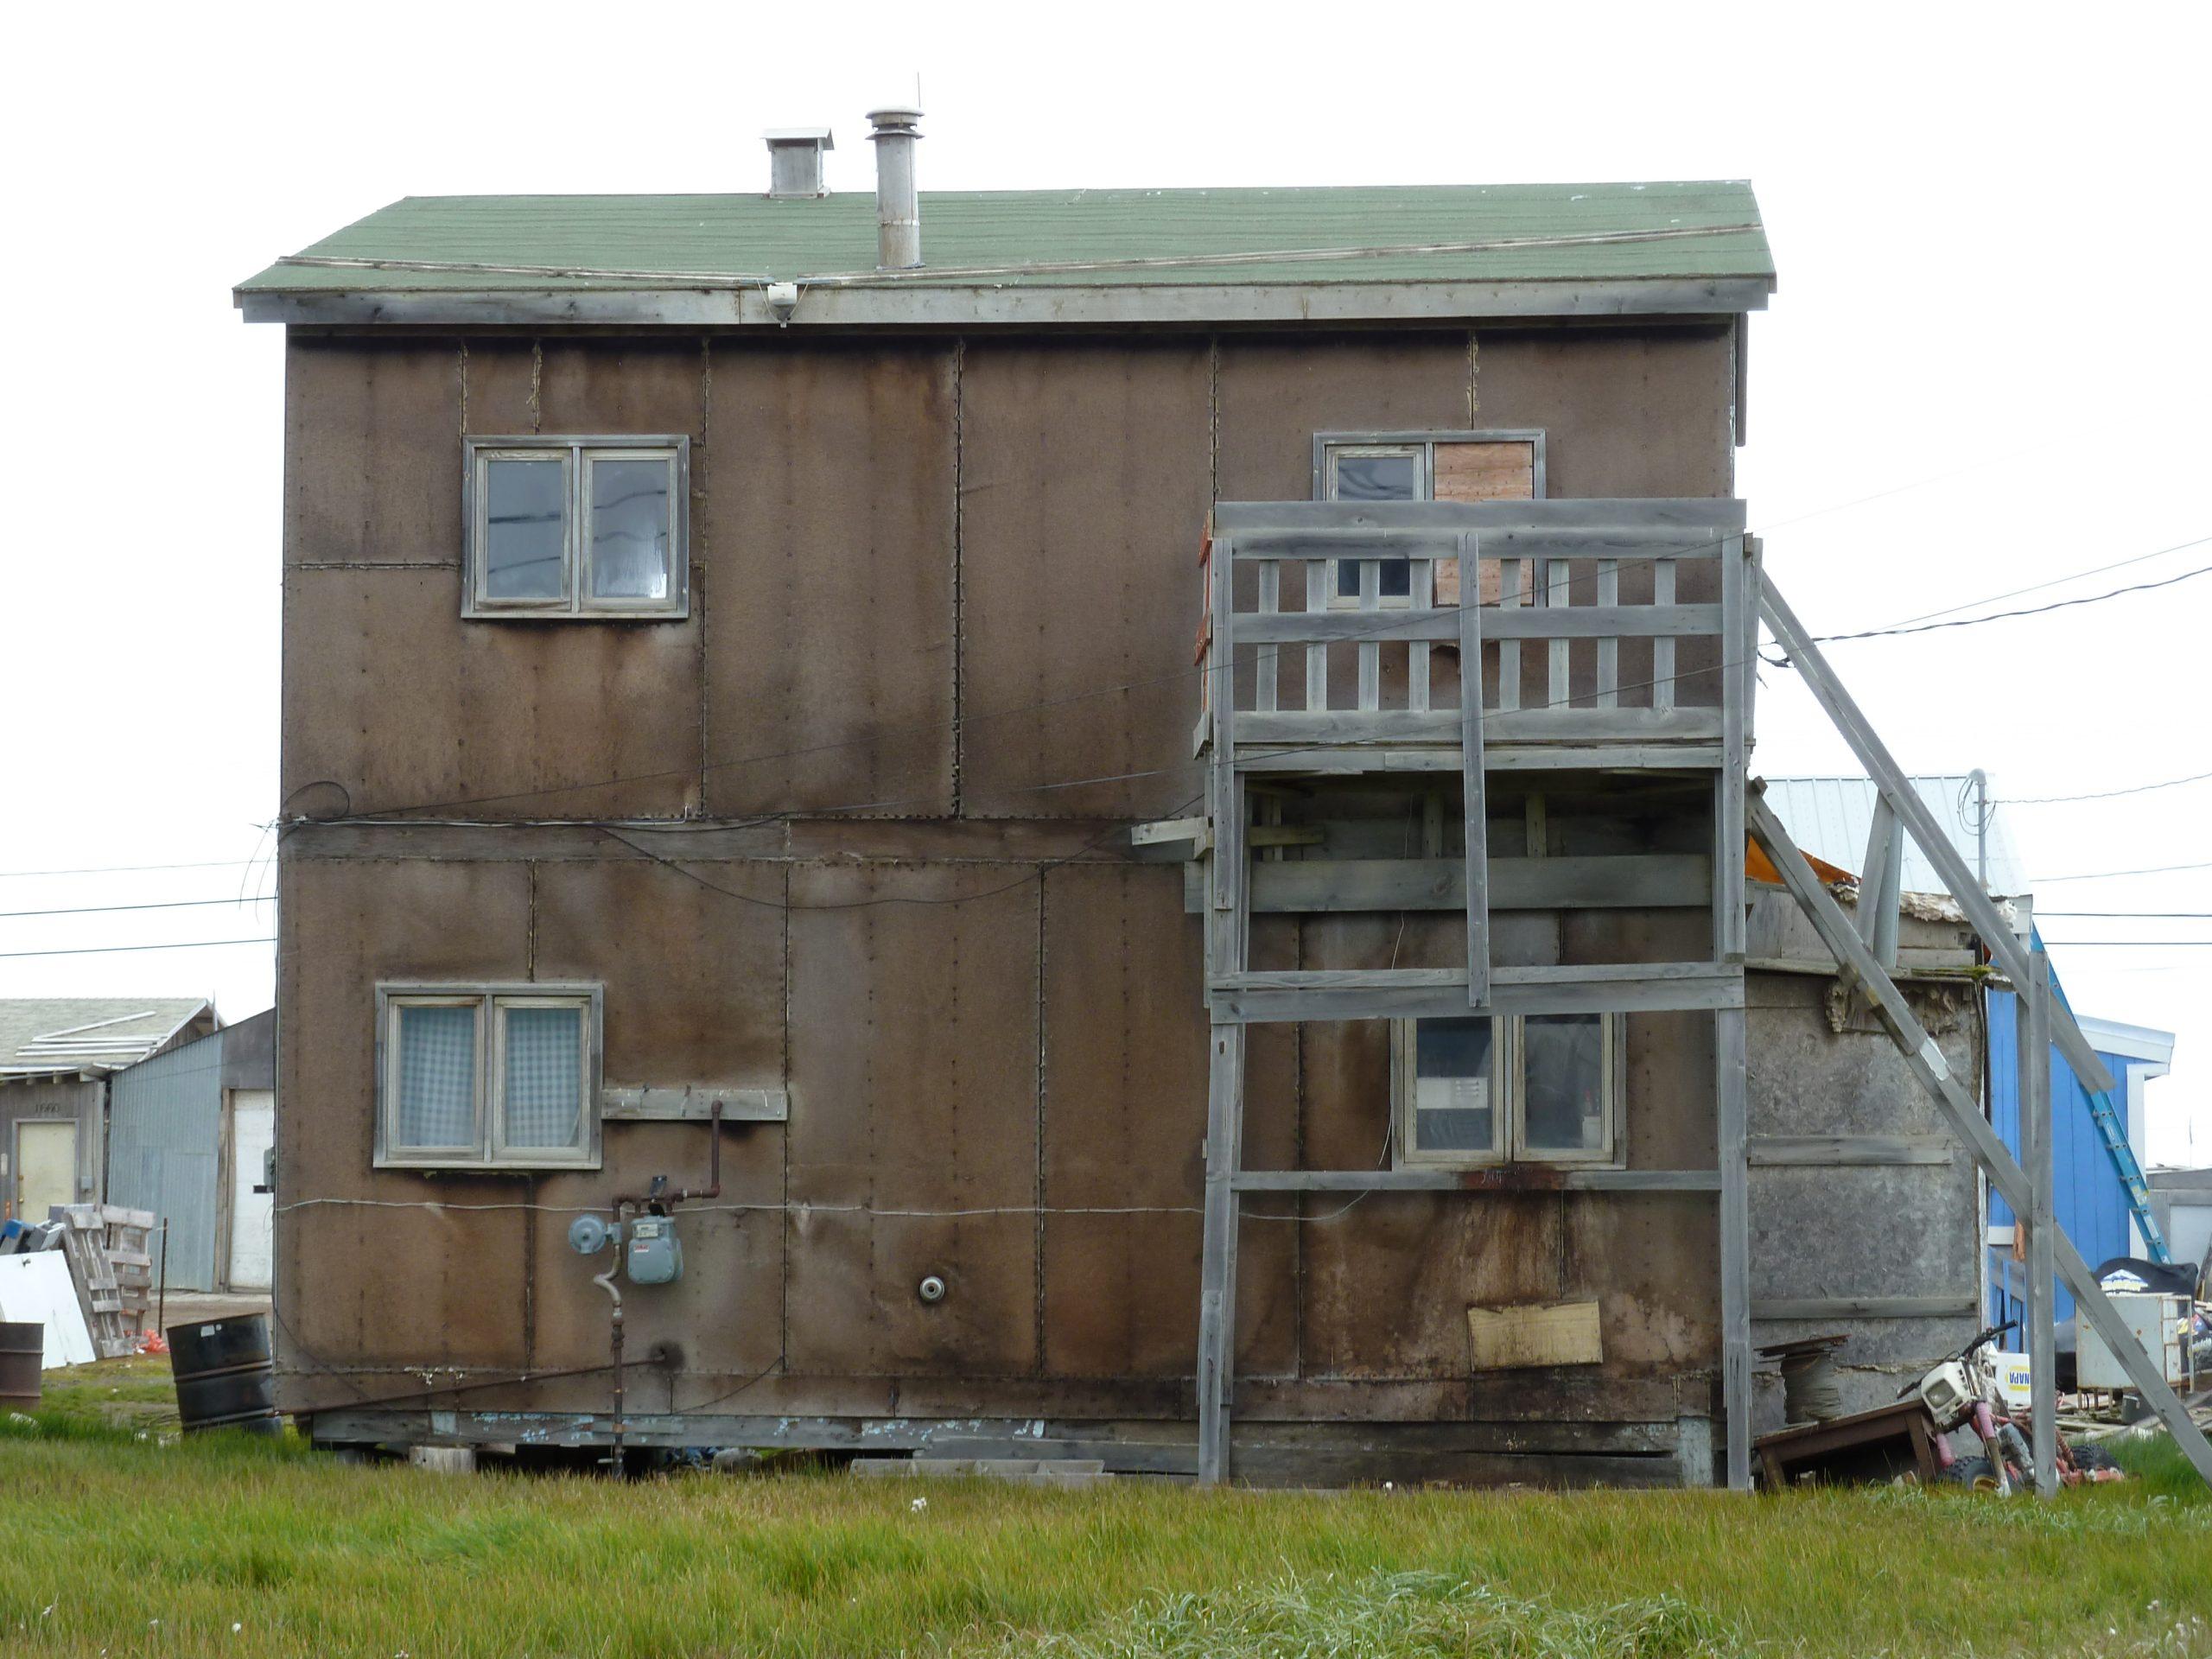 Radreise Alaska 2010 - Altes Haus in Barrow